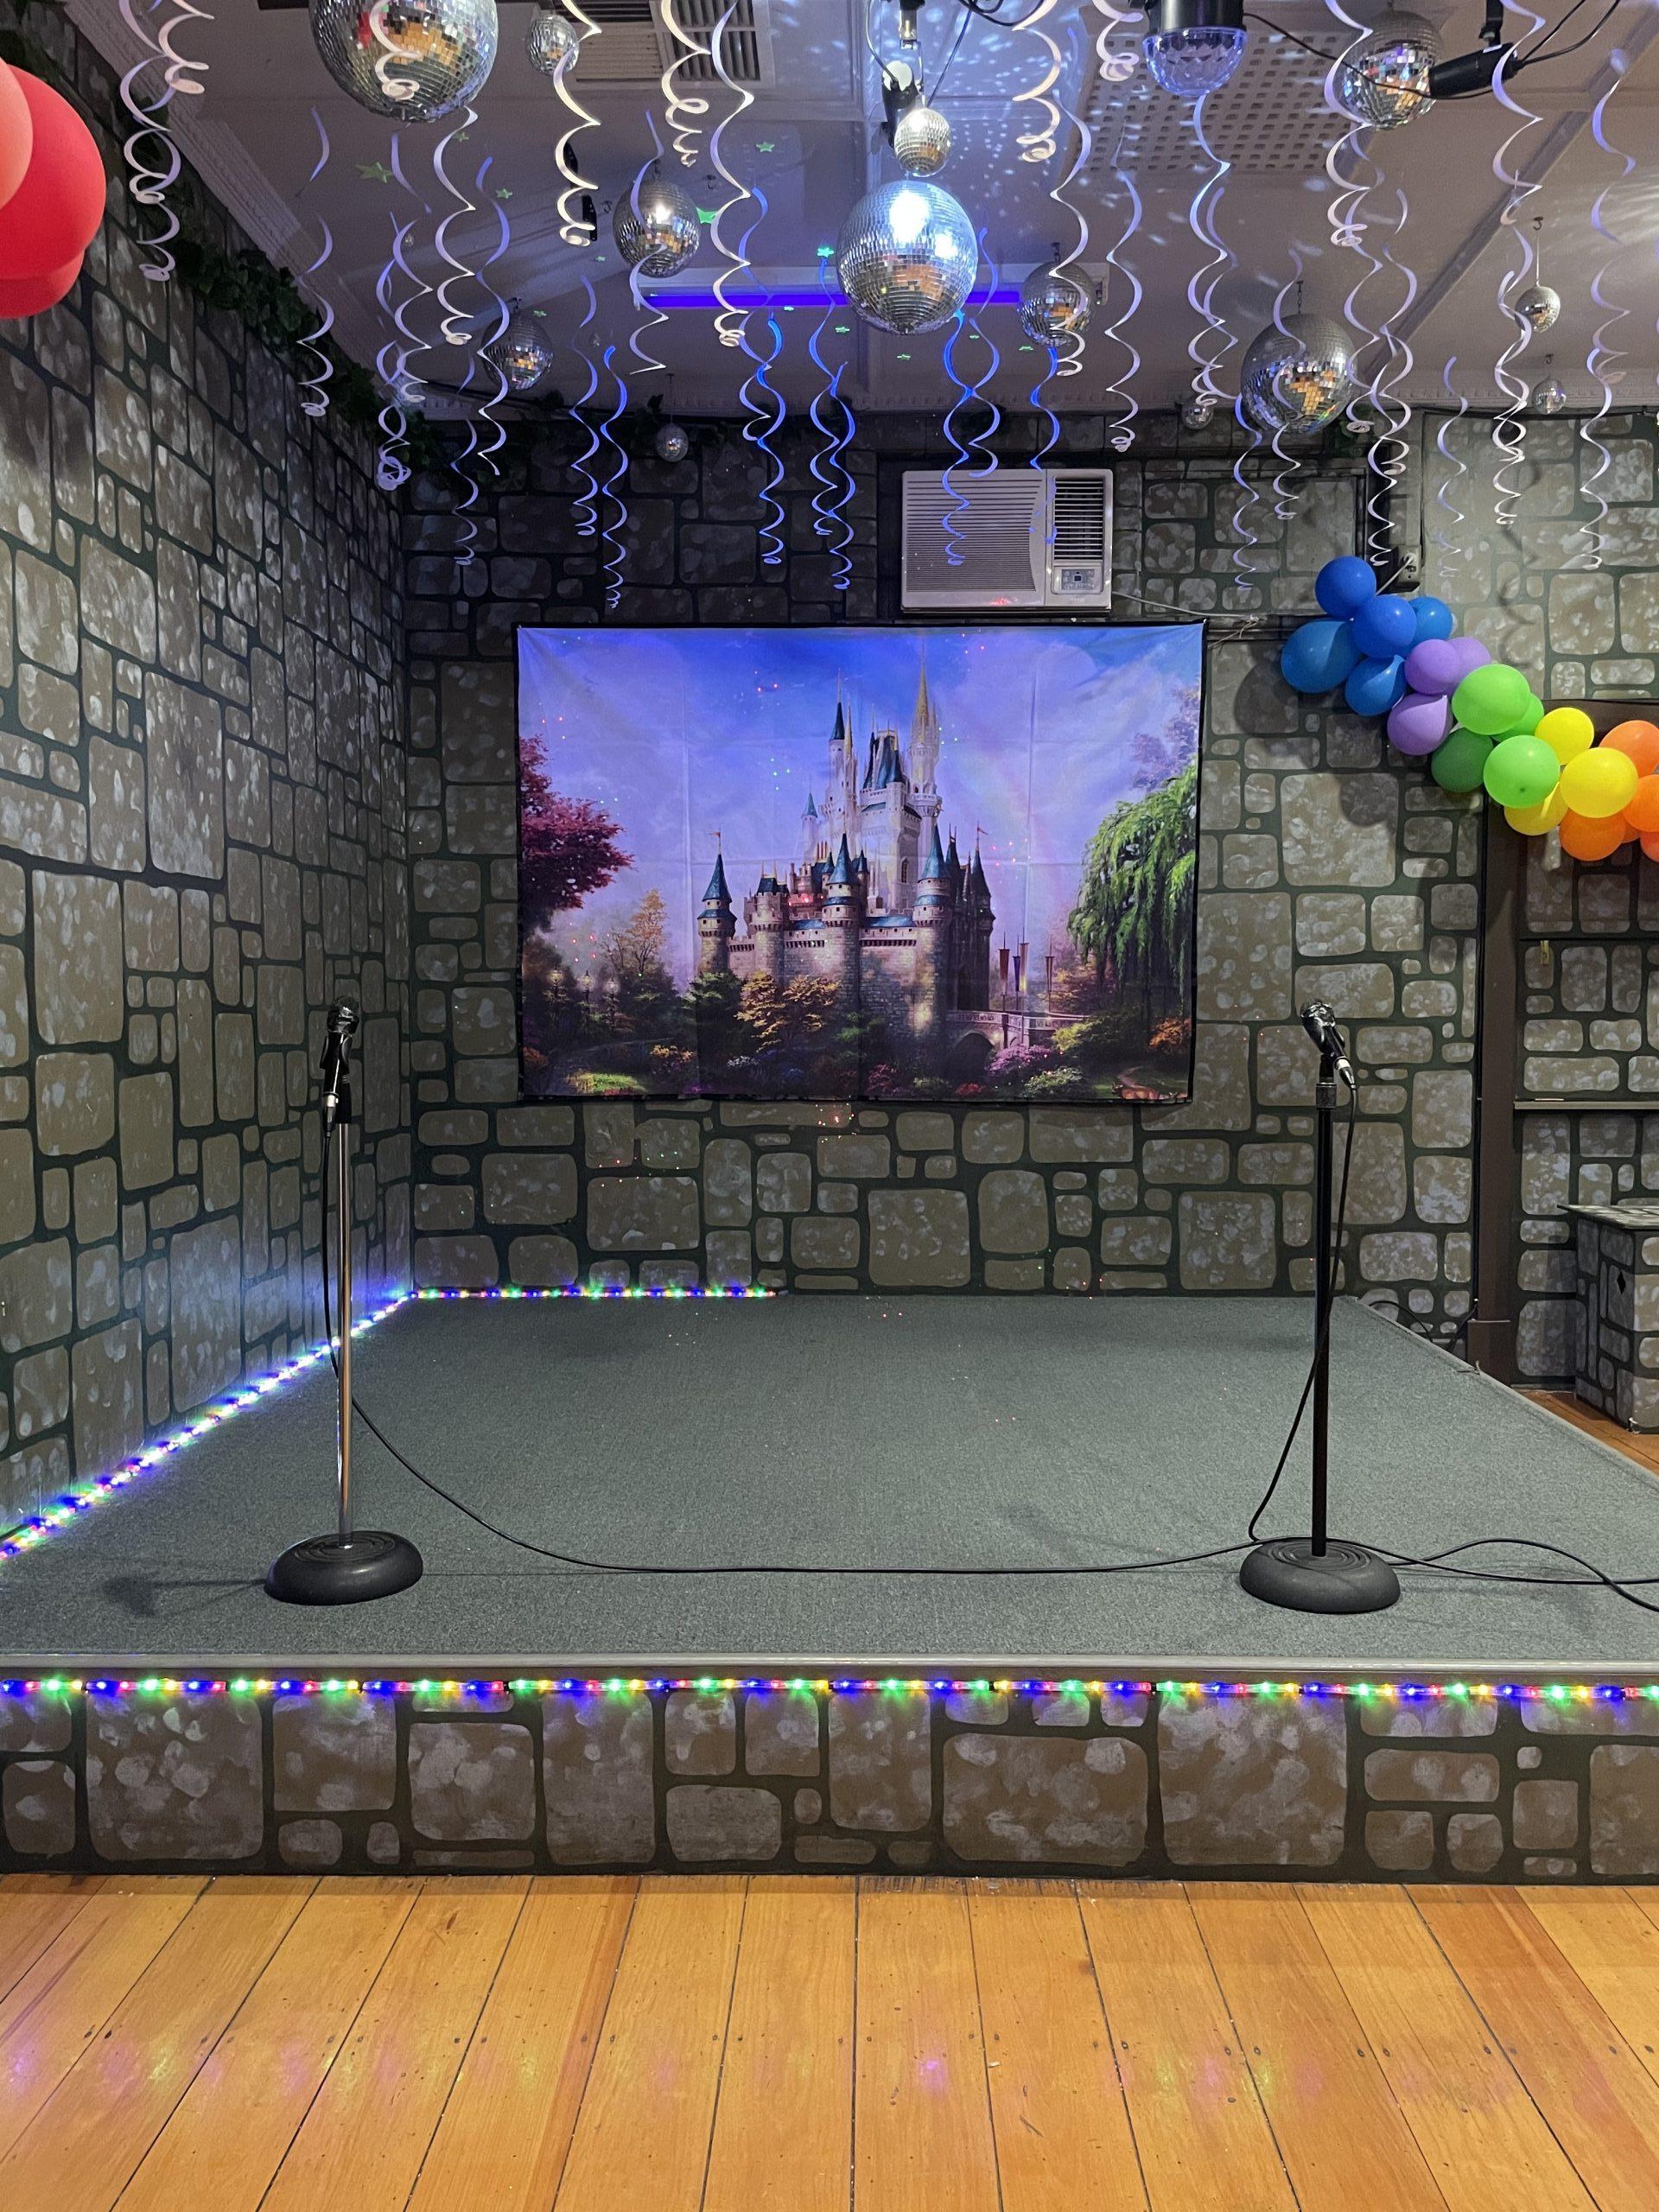 https://enchantedpalace.com.au/wp-content/uploads/2021/04/Disney_Princess_3-scaled-e1619724826702.jpg